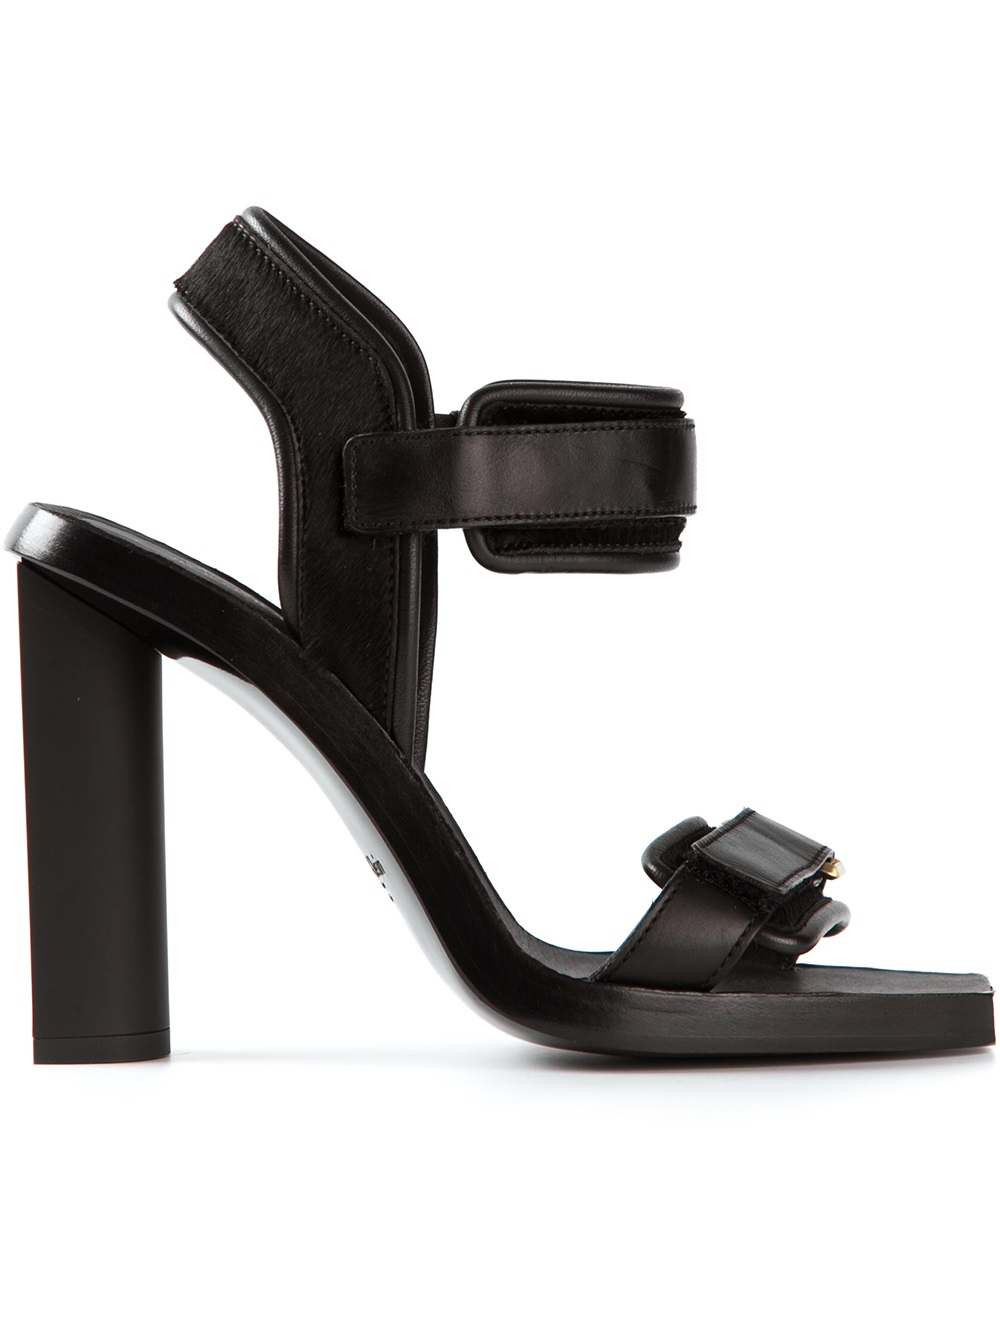 Black sandals chunky heel - Gallery